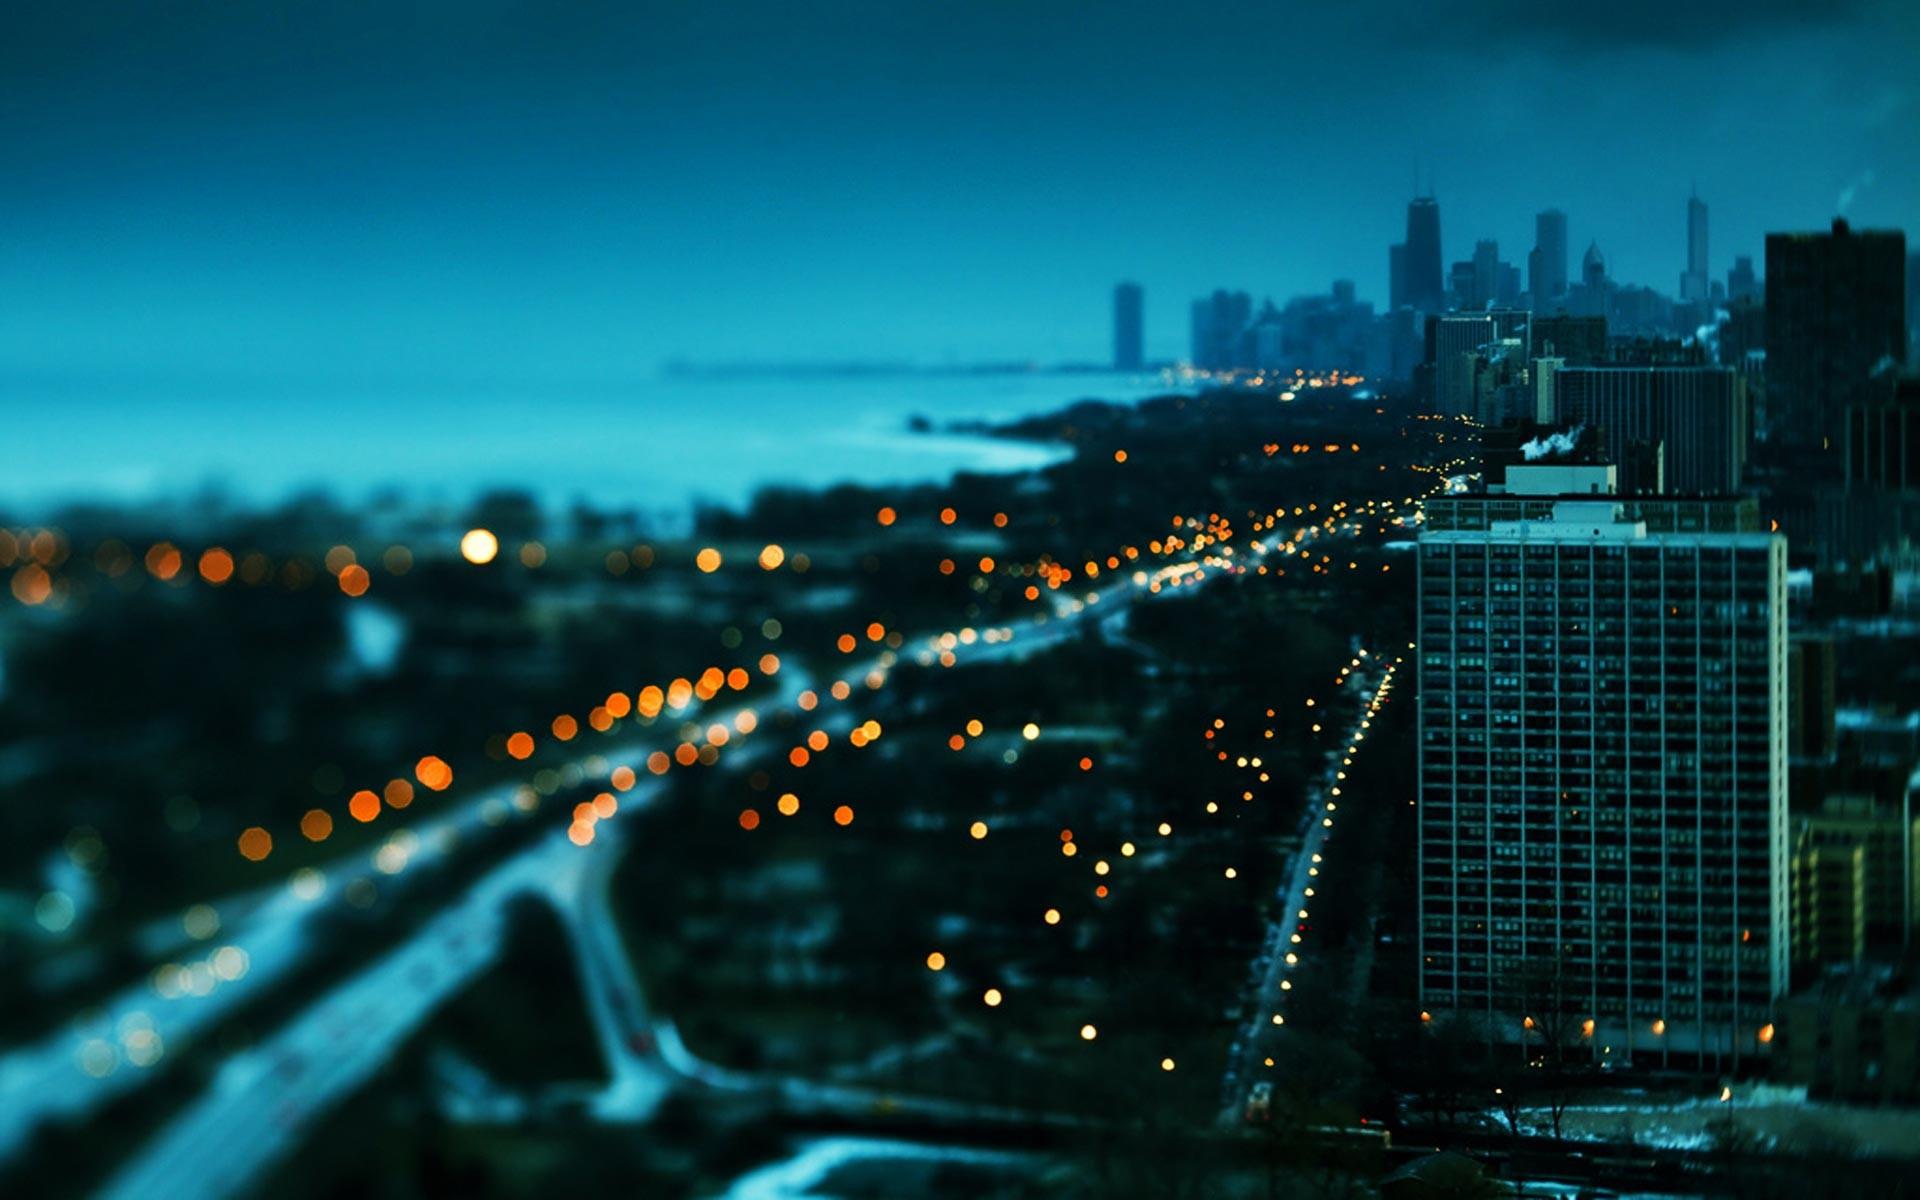 … hd wallpaper city wallpapersafari; night i hd images part 3 …